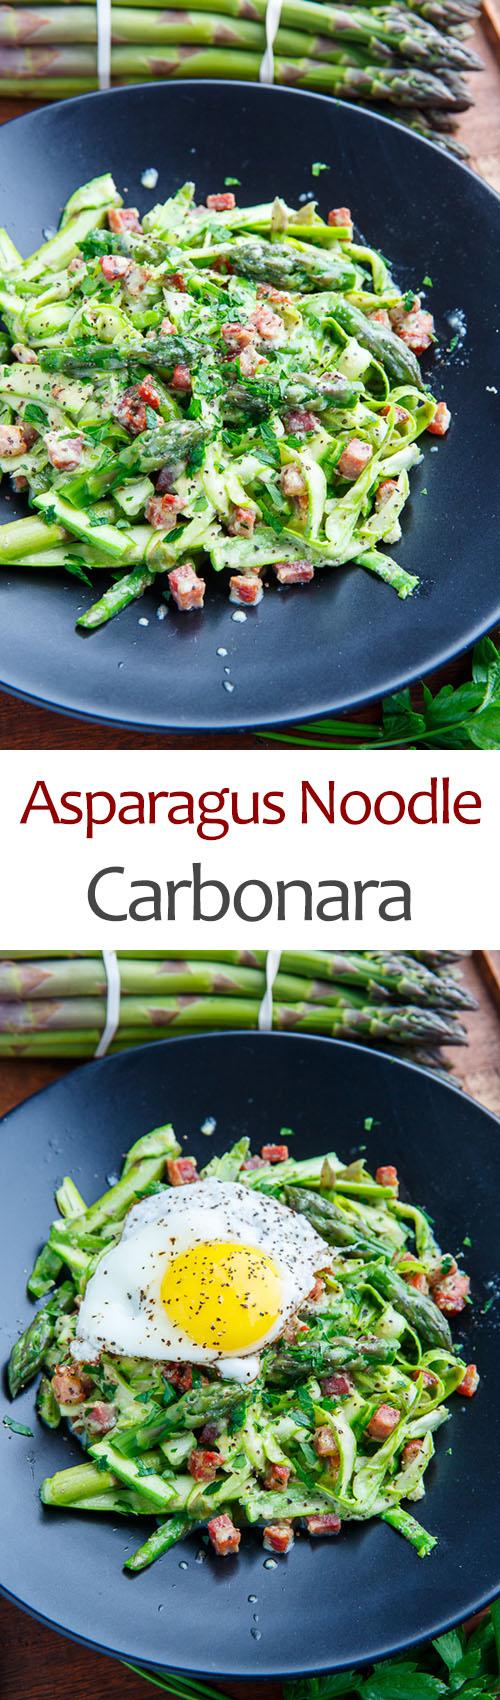 Asparagus Noodle Carbonara